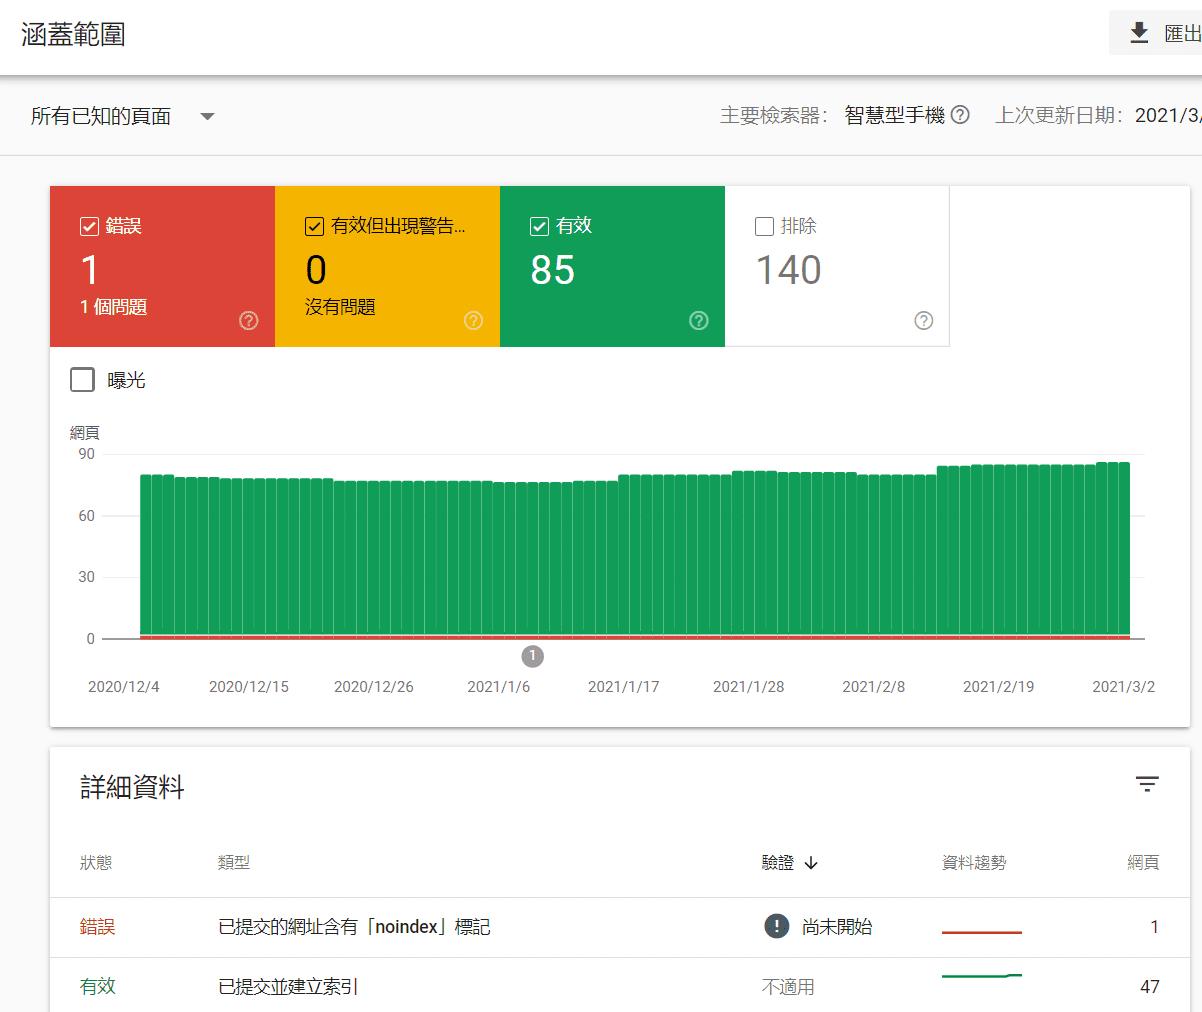 涵蓋範圍 - Google seach console